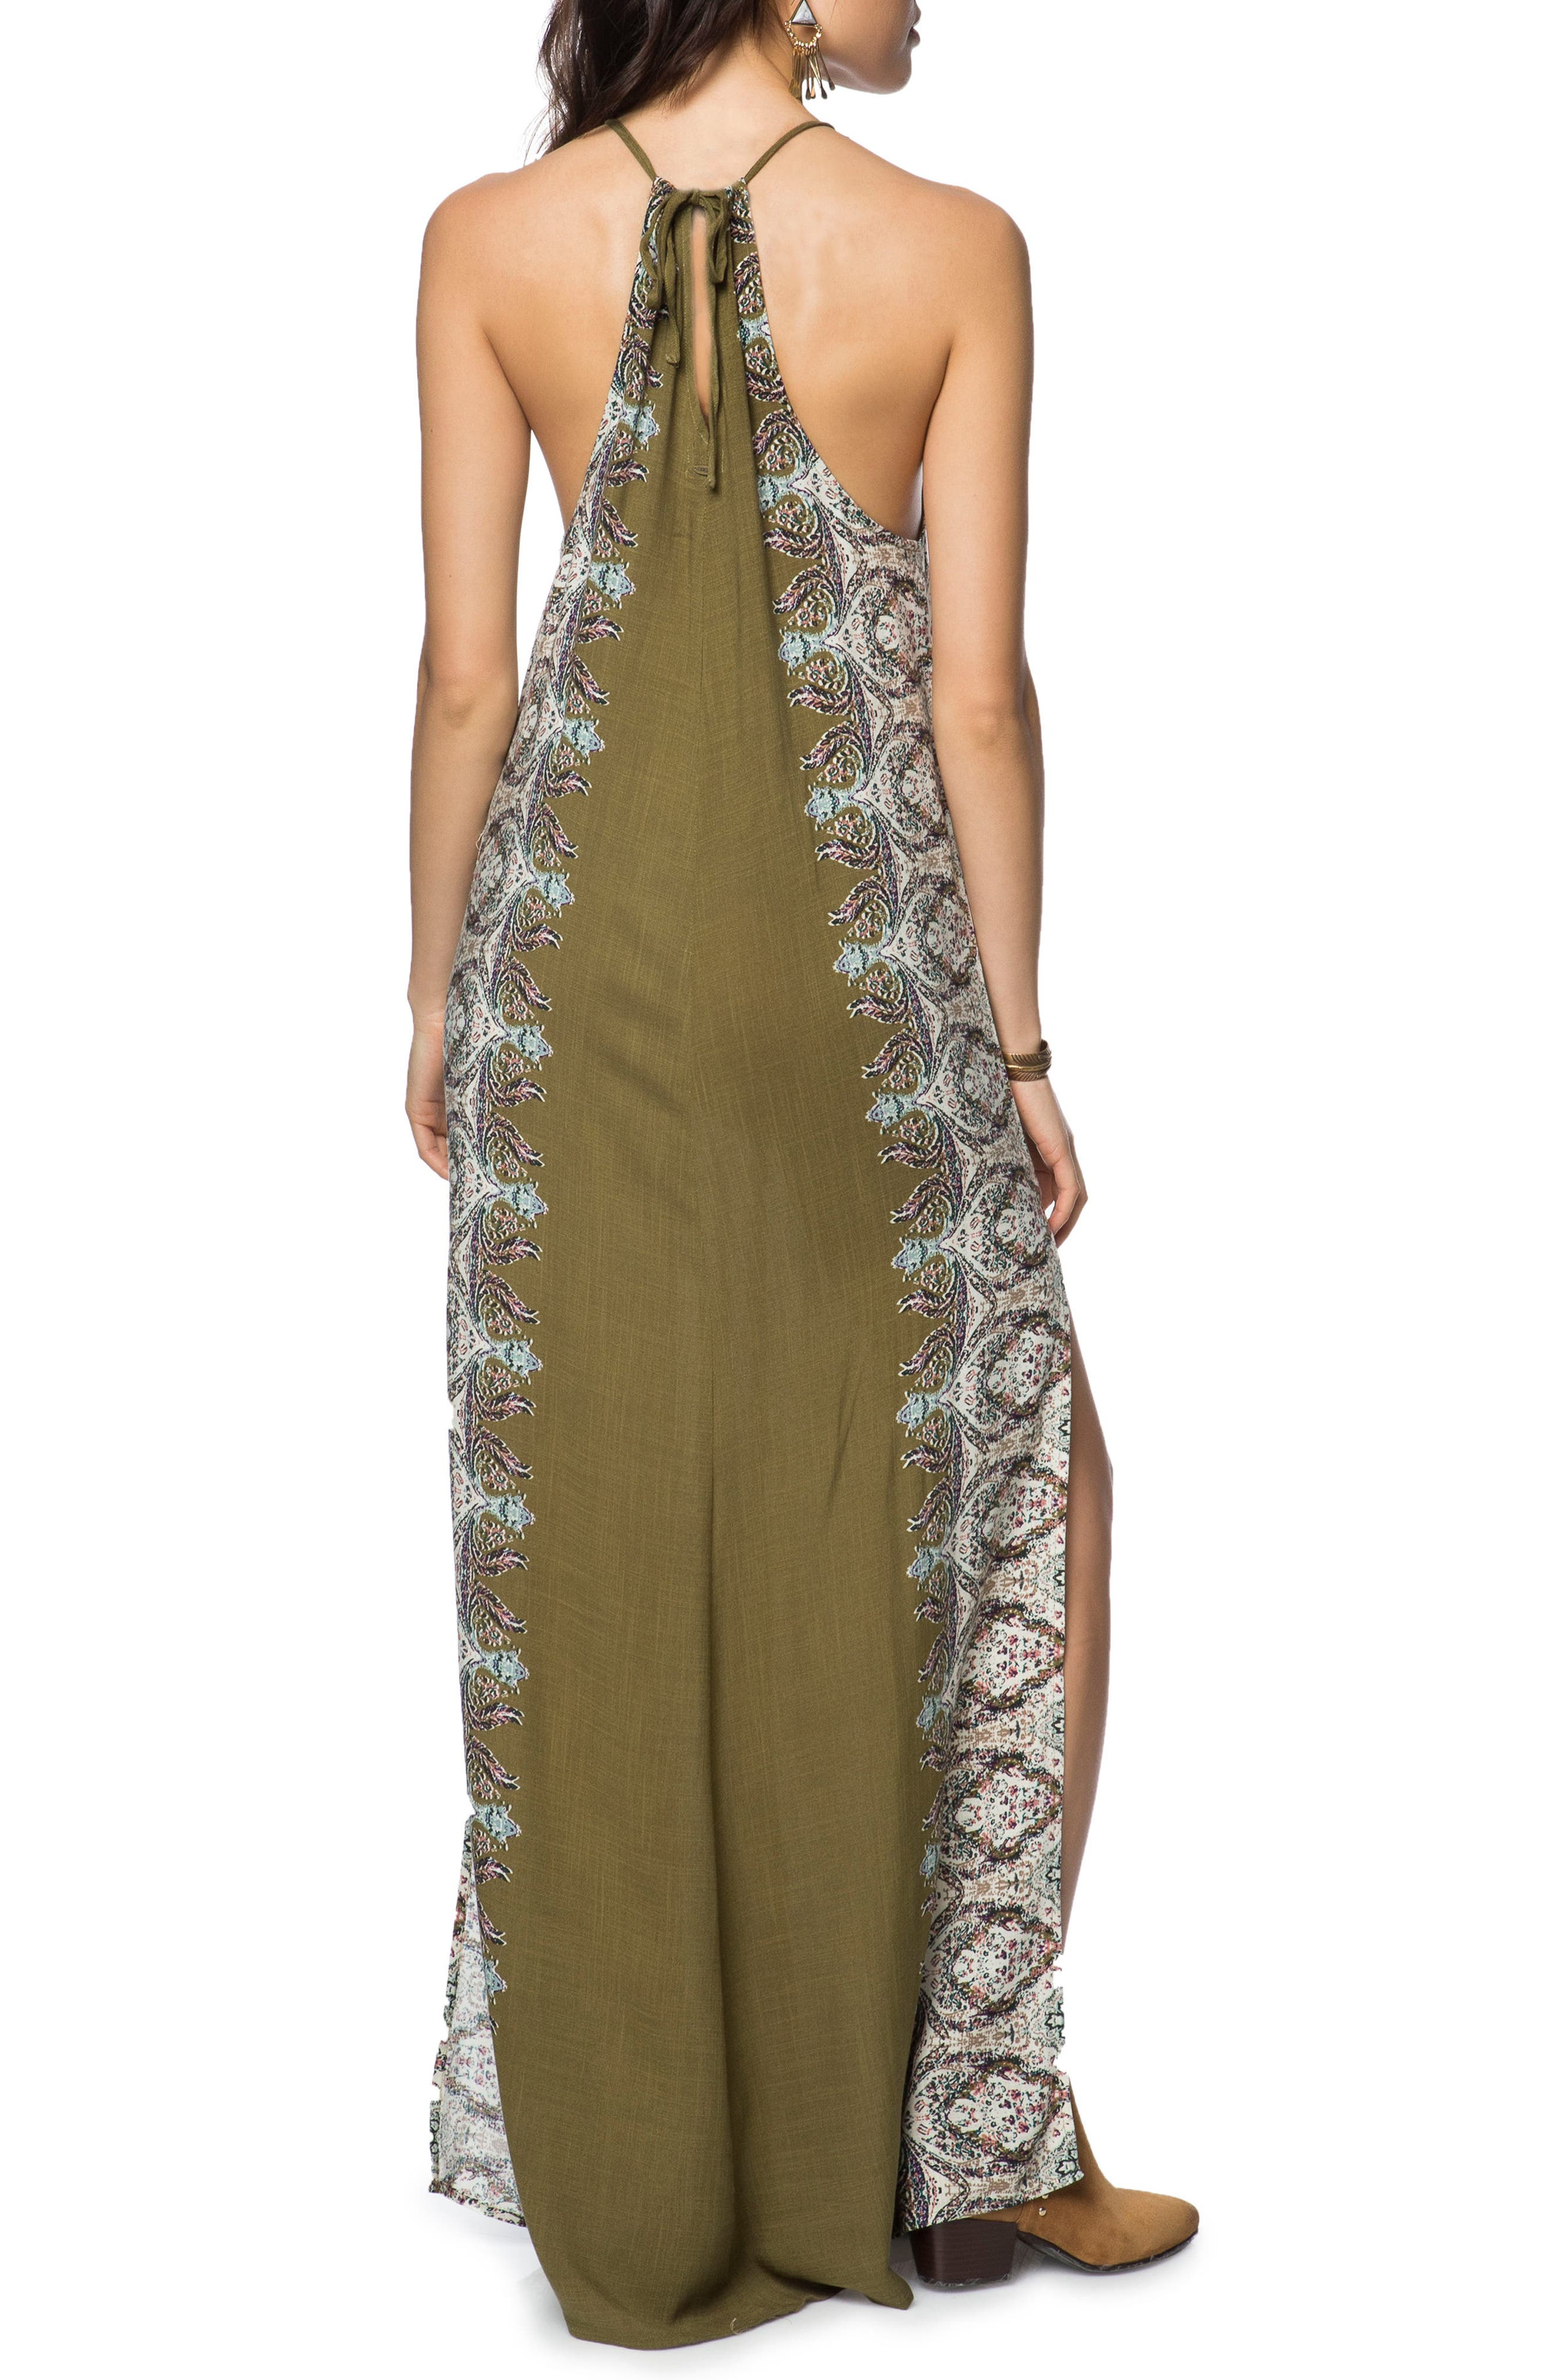 Brinkley Maxi Dress,                             Alternate thumbnail 2, color,                             Military